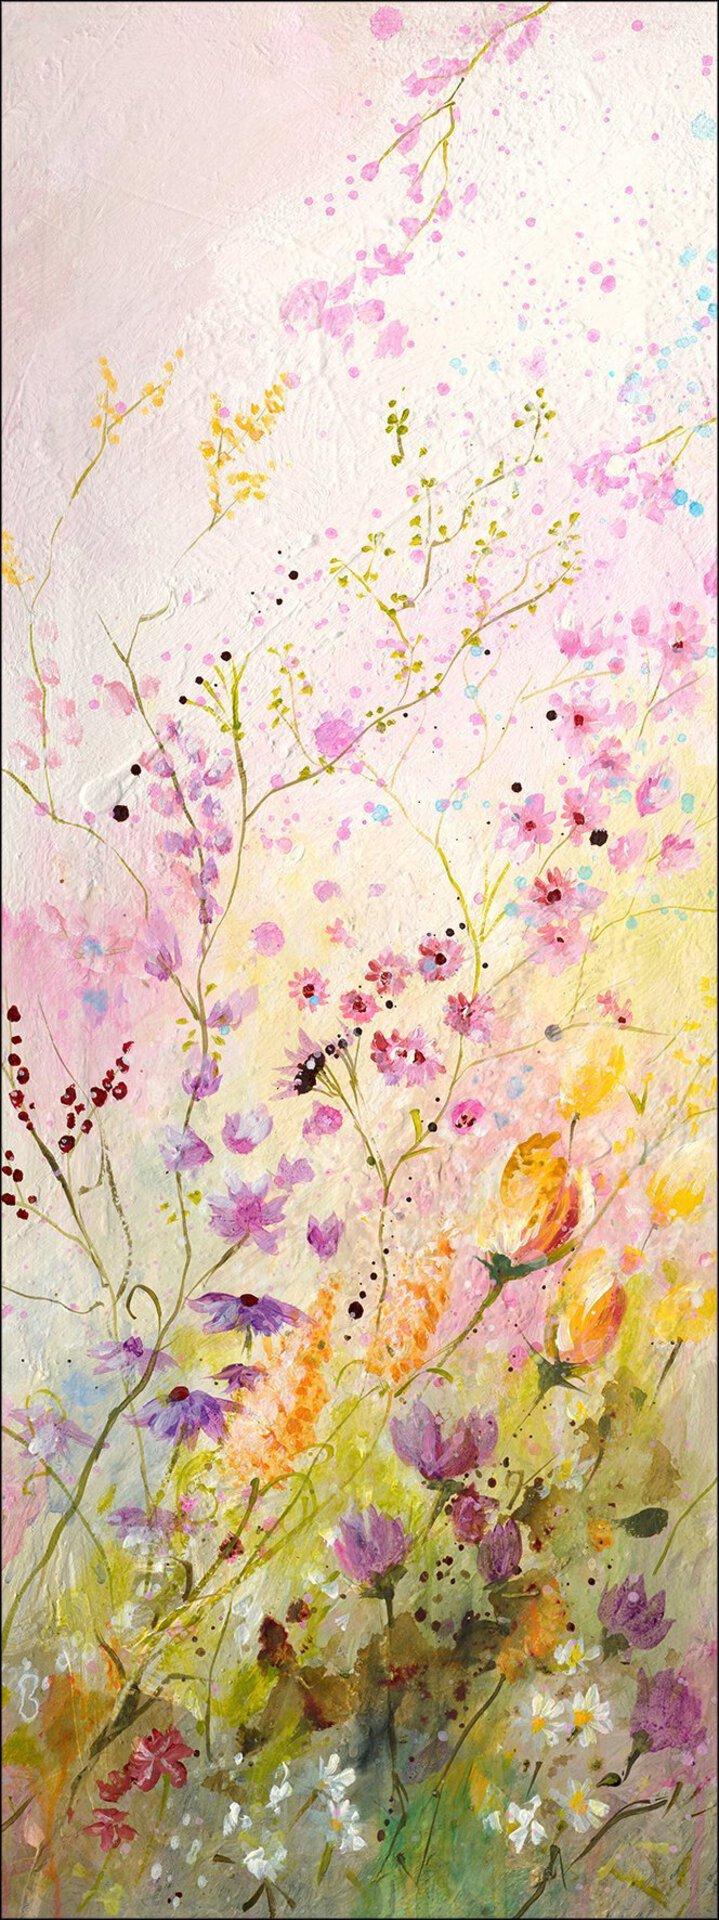 Bild Flower Landscape I Pro-Art Holzwerkstoff mehrfarbig 77 x 27 x 2 cm